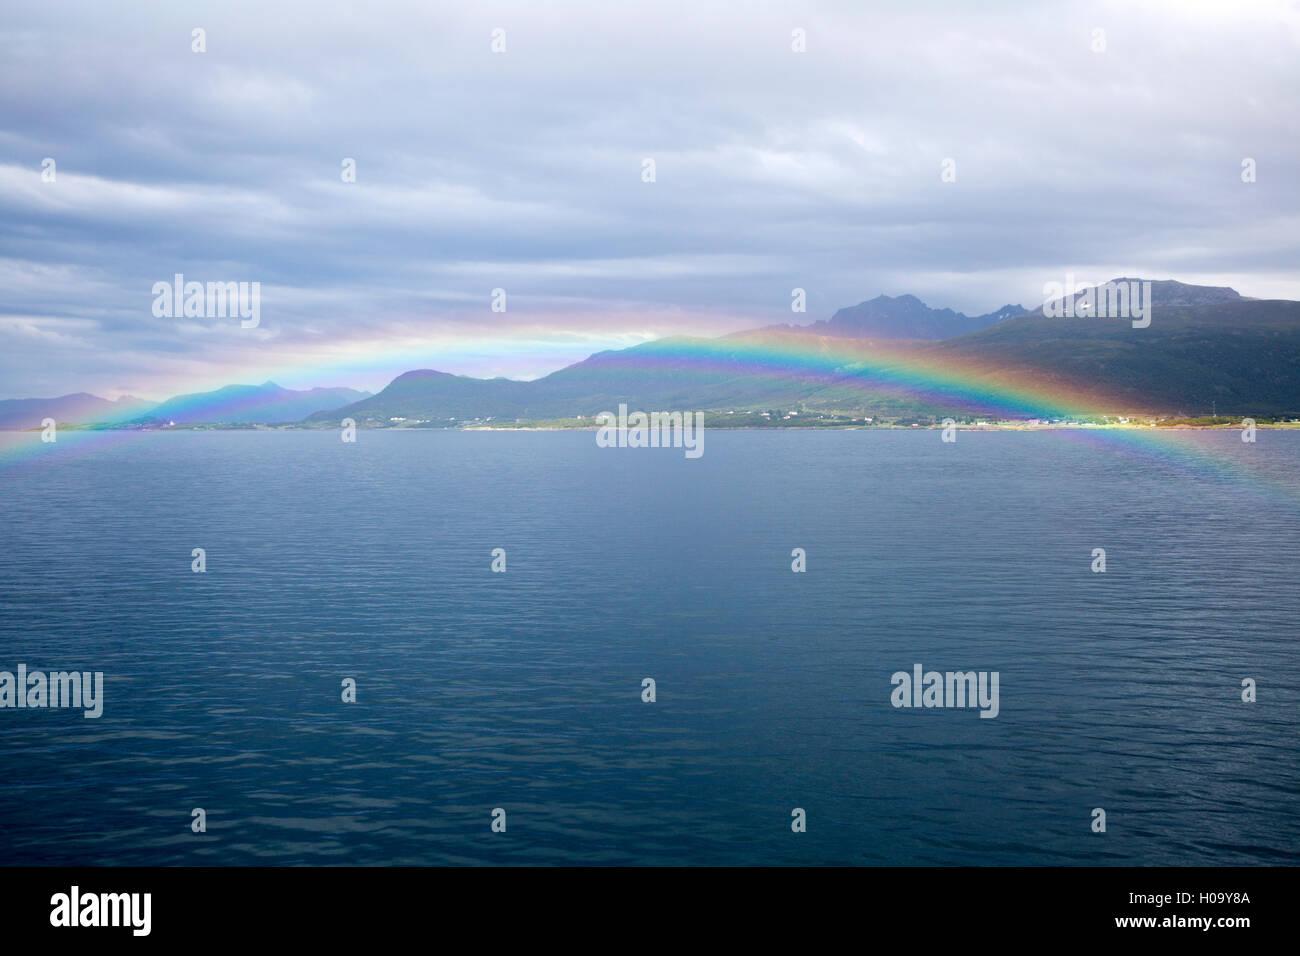 Rainbow over sea near Stokmarknes, Hadsel municipality, Hadseloya island, Nordland, Vesteralen region, northern - Stock Image